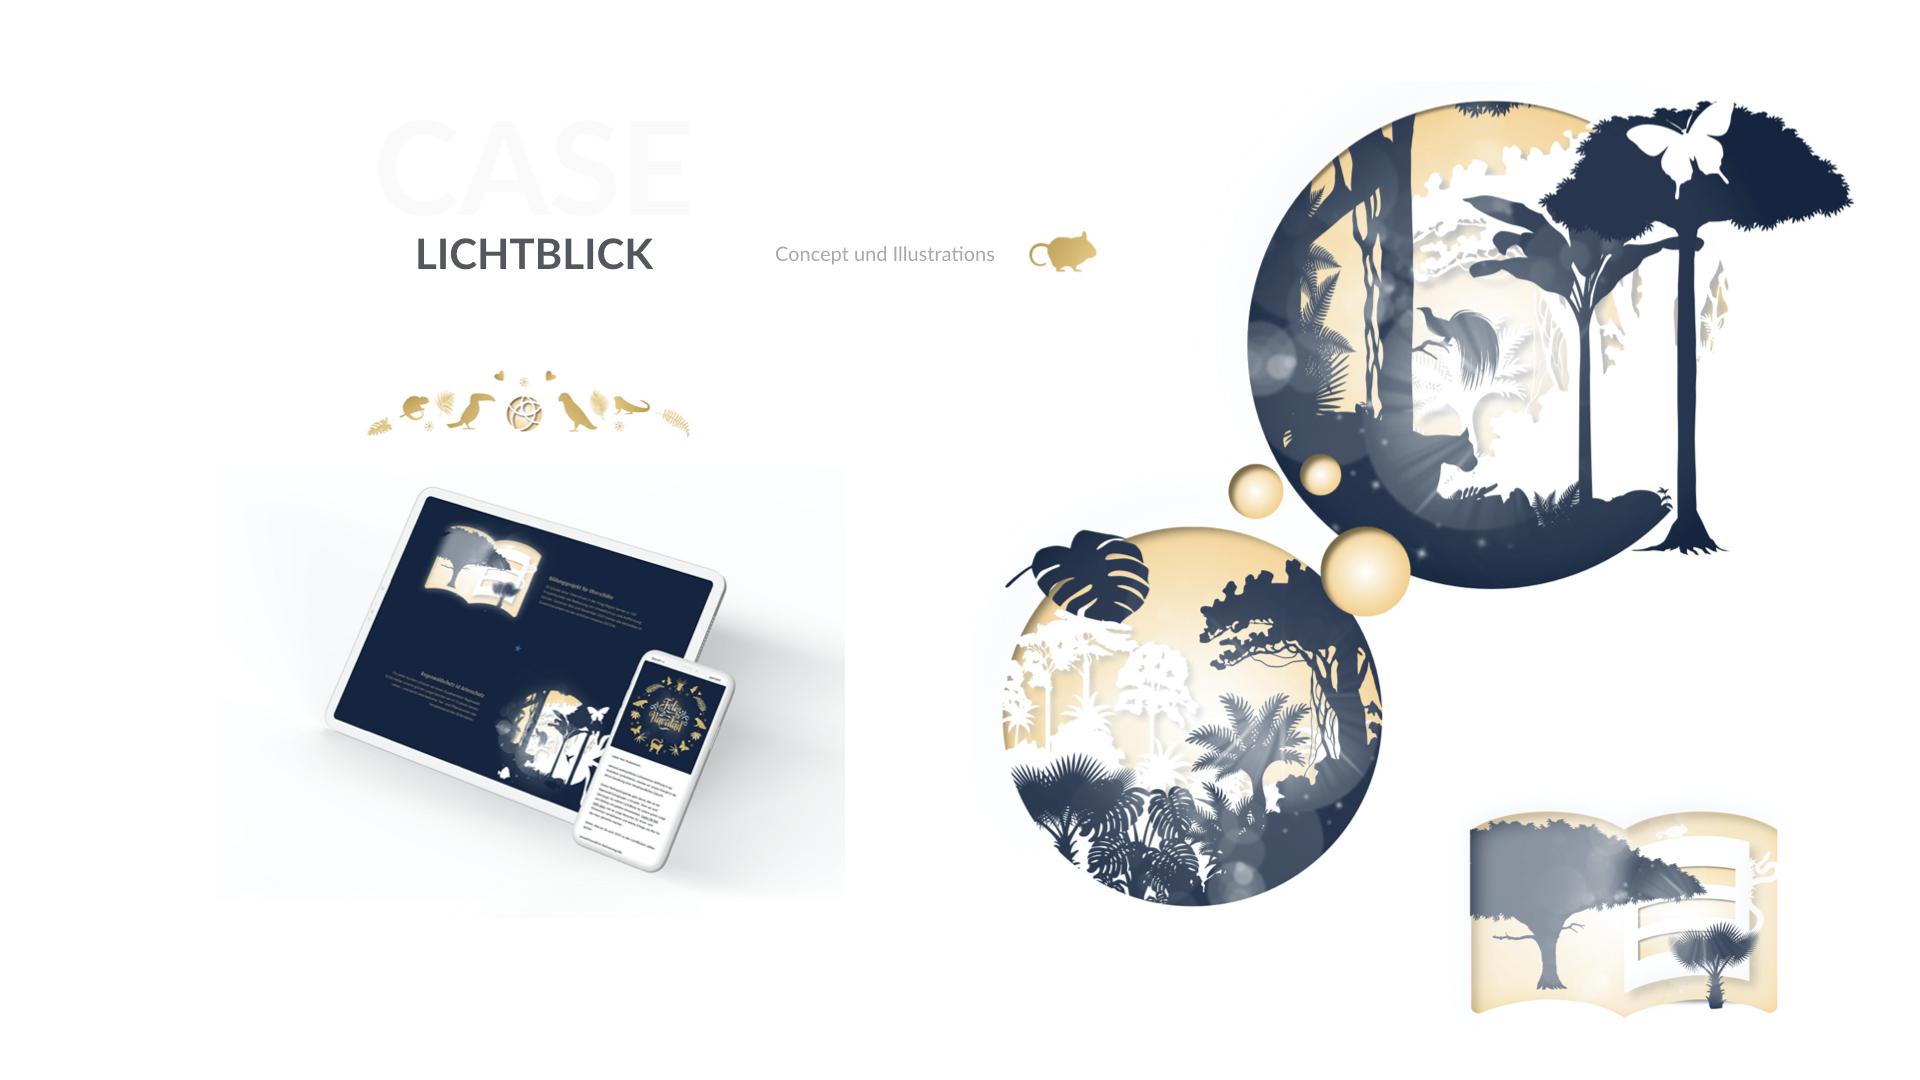 lichtblick_xmas